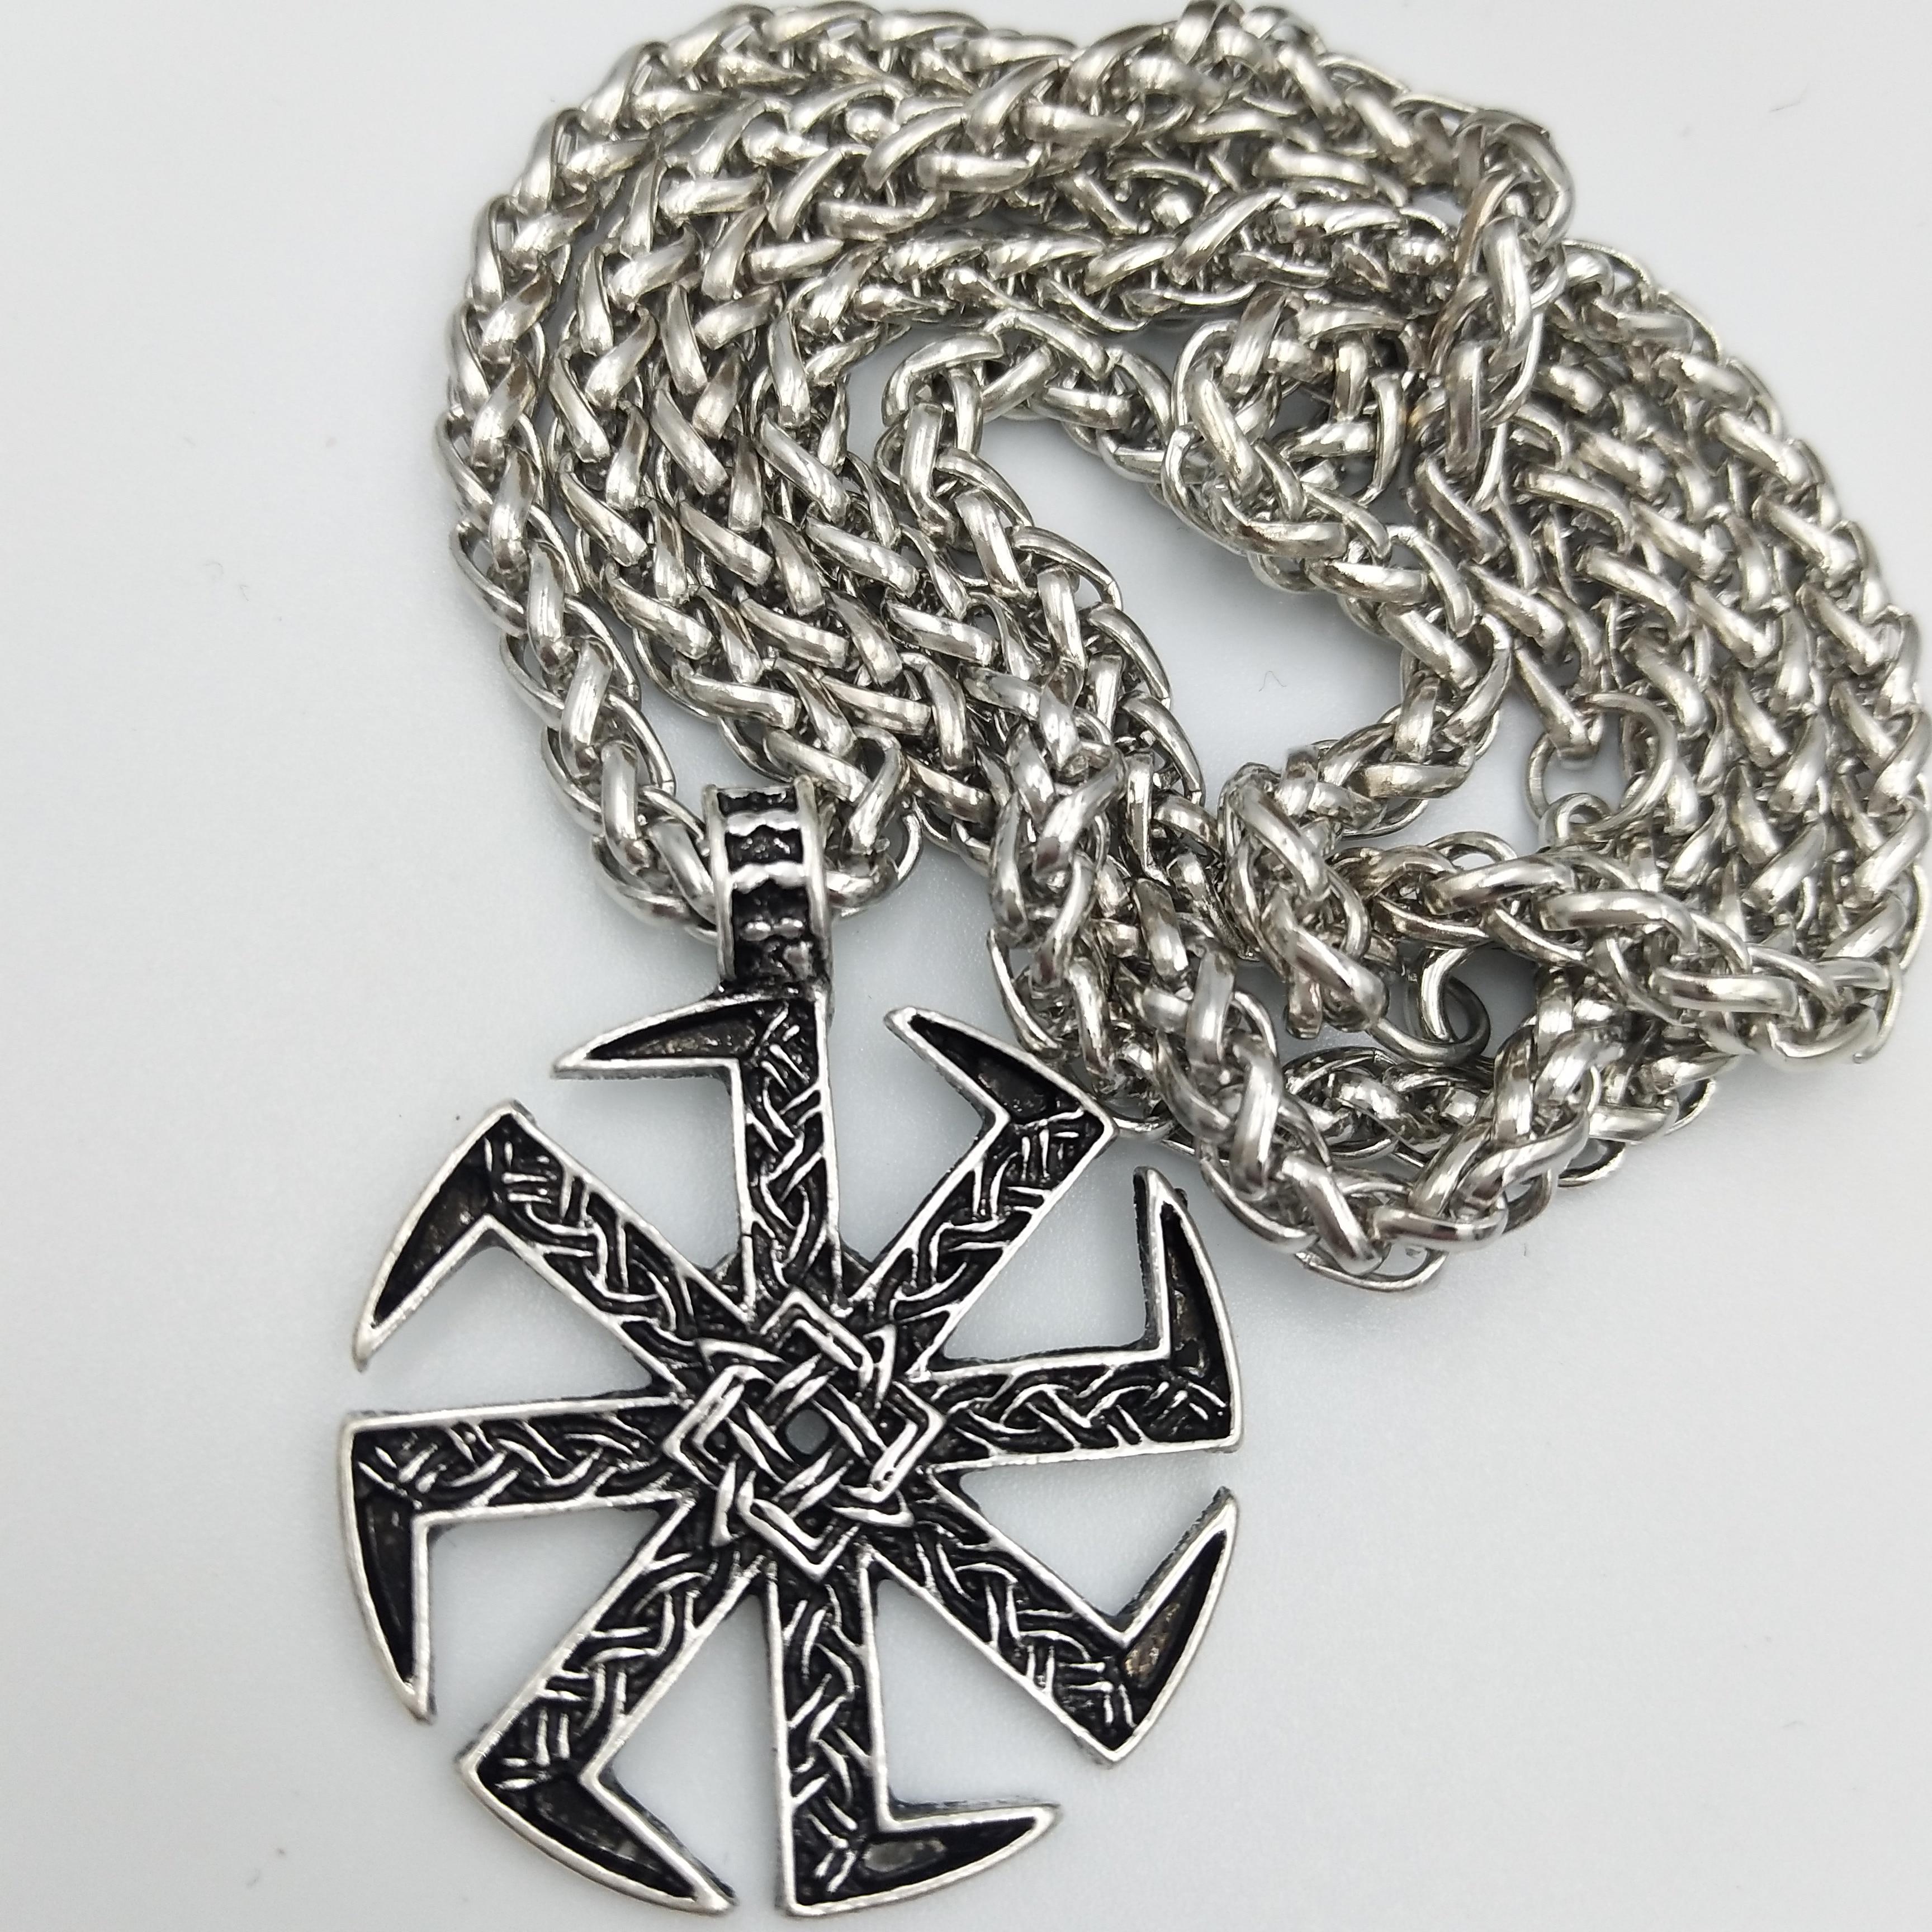 Vintage Nordic Viking Slavic Symbol Sun Wheel Kolovrat Pendant Talisman Necklace